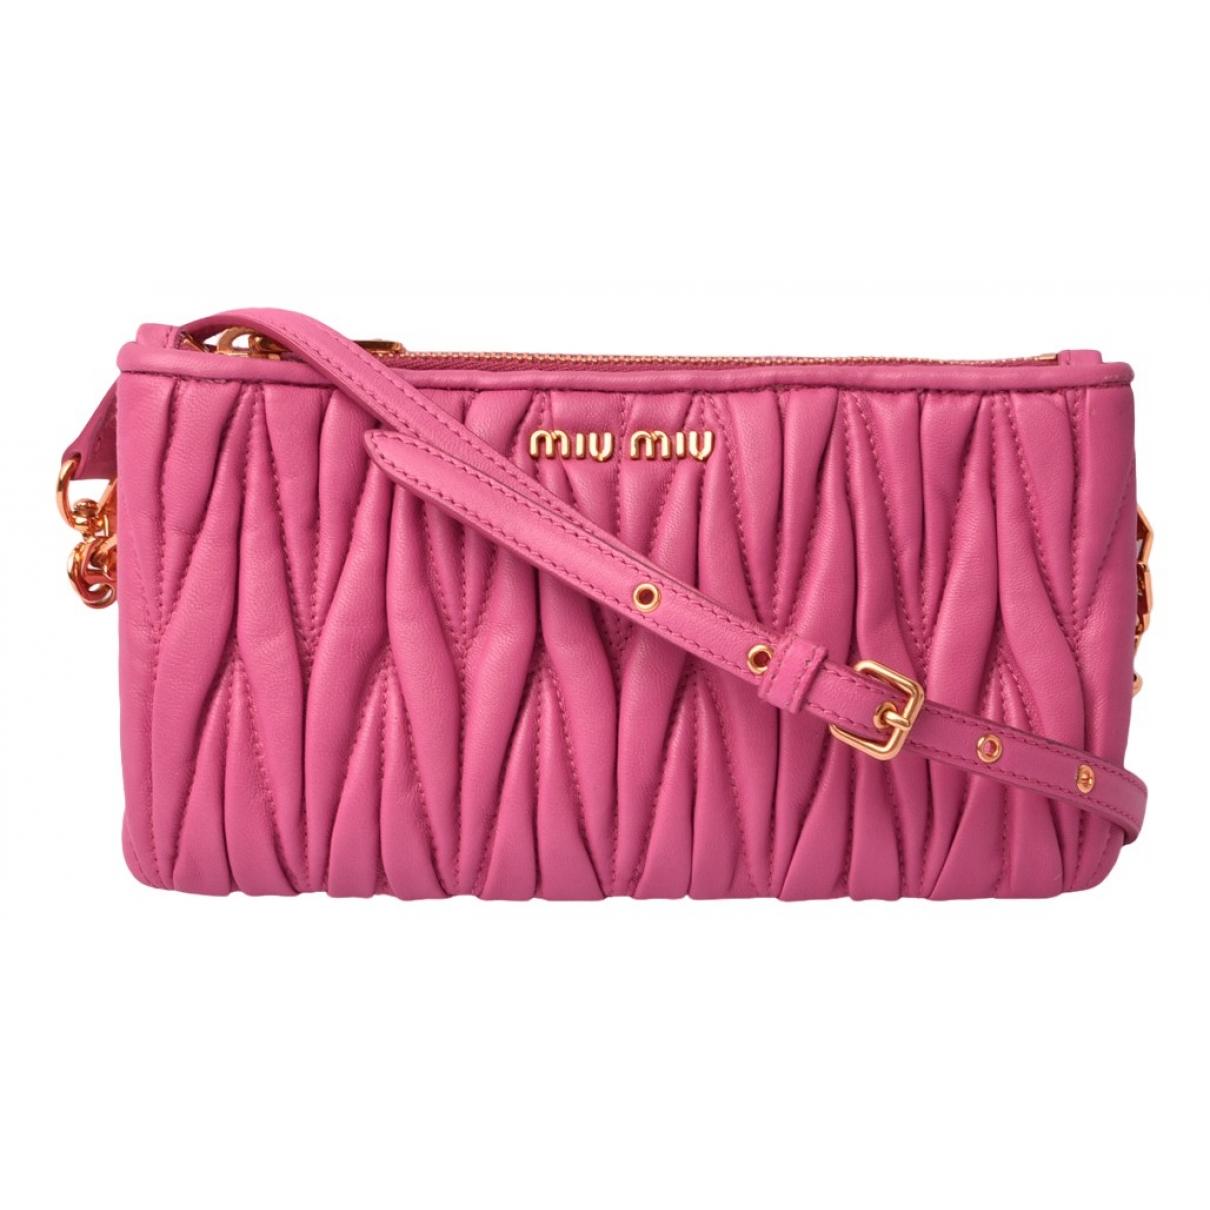 Miu Miu - Pochette Matelasse pour femme en cuir - rose